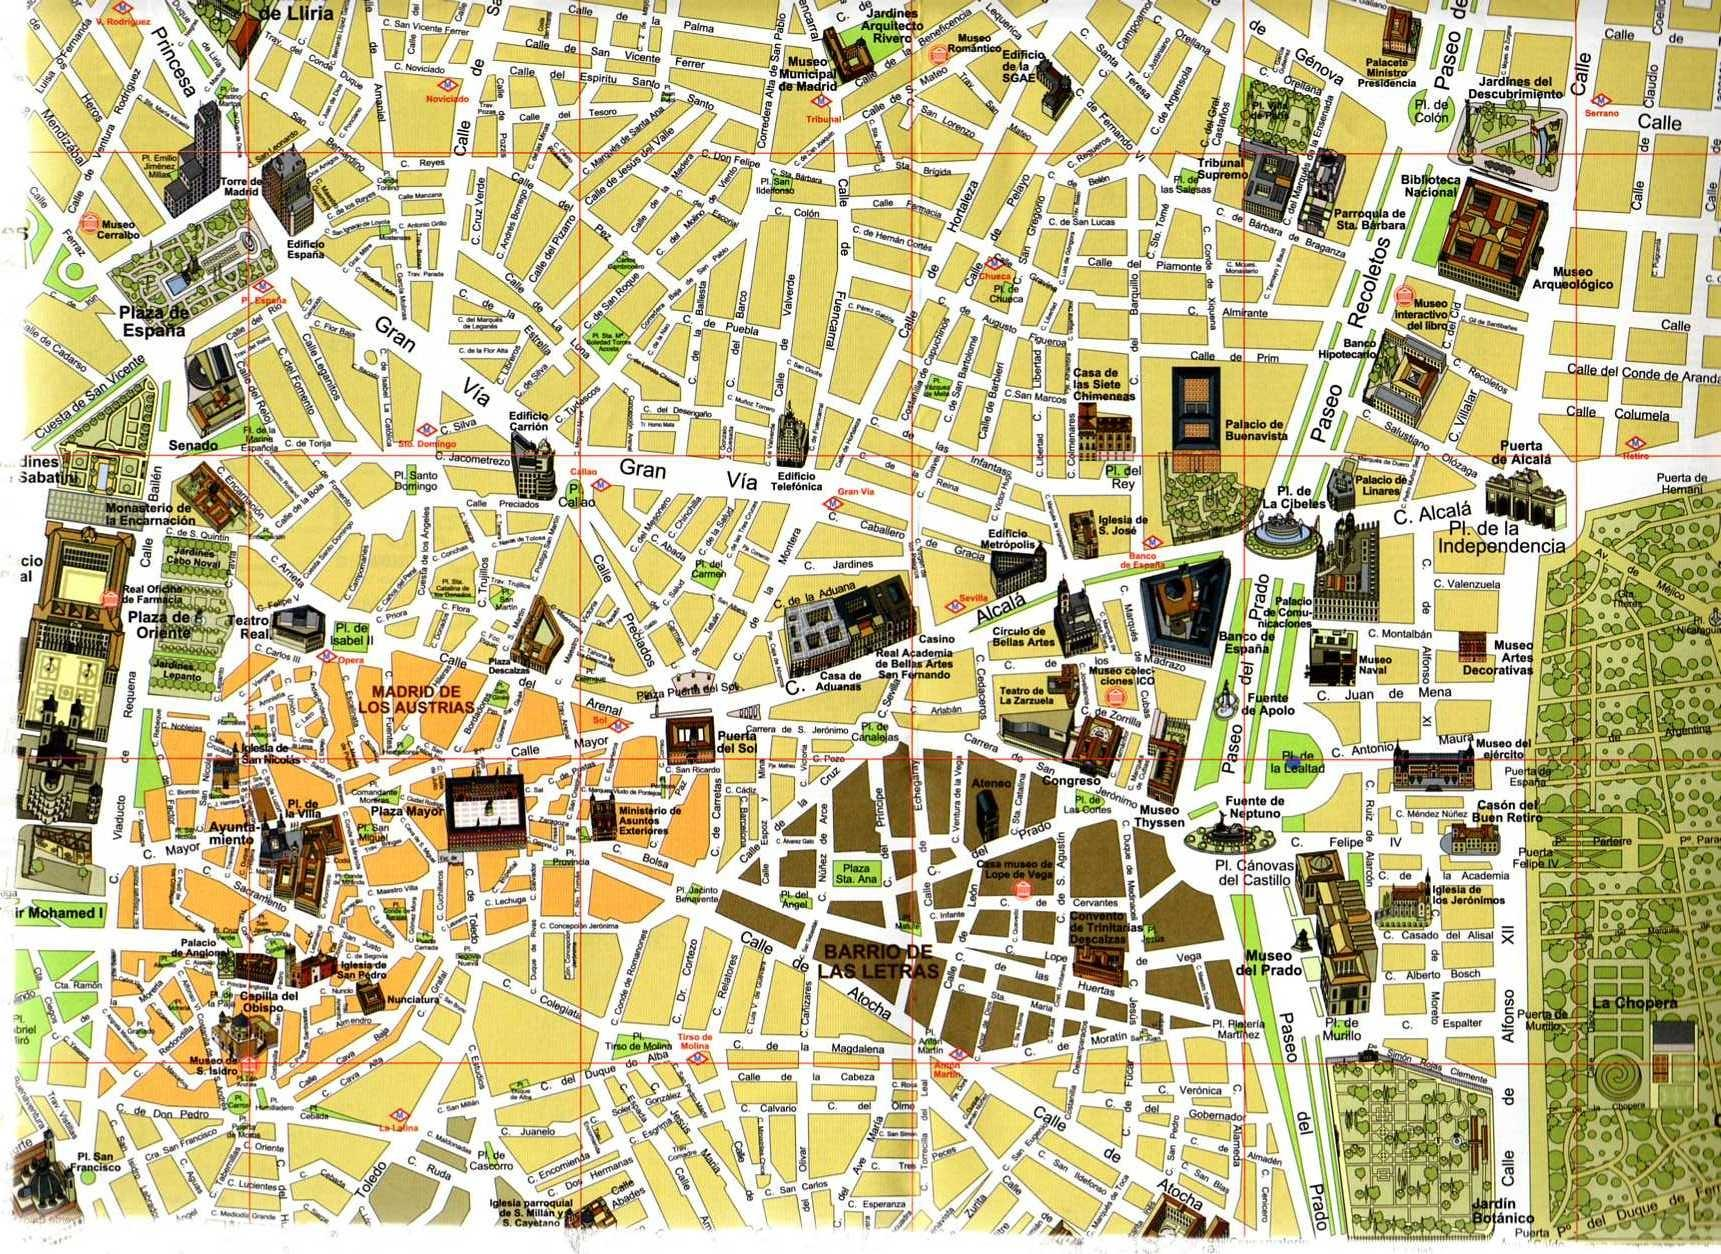 Madrid tourist map